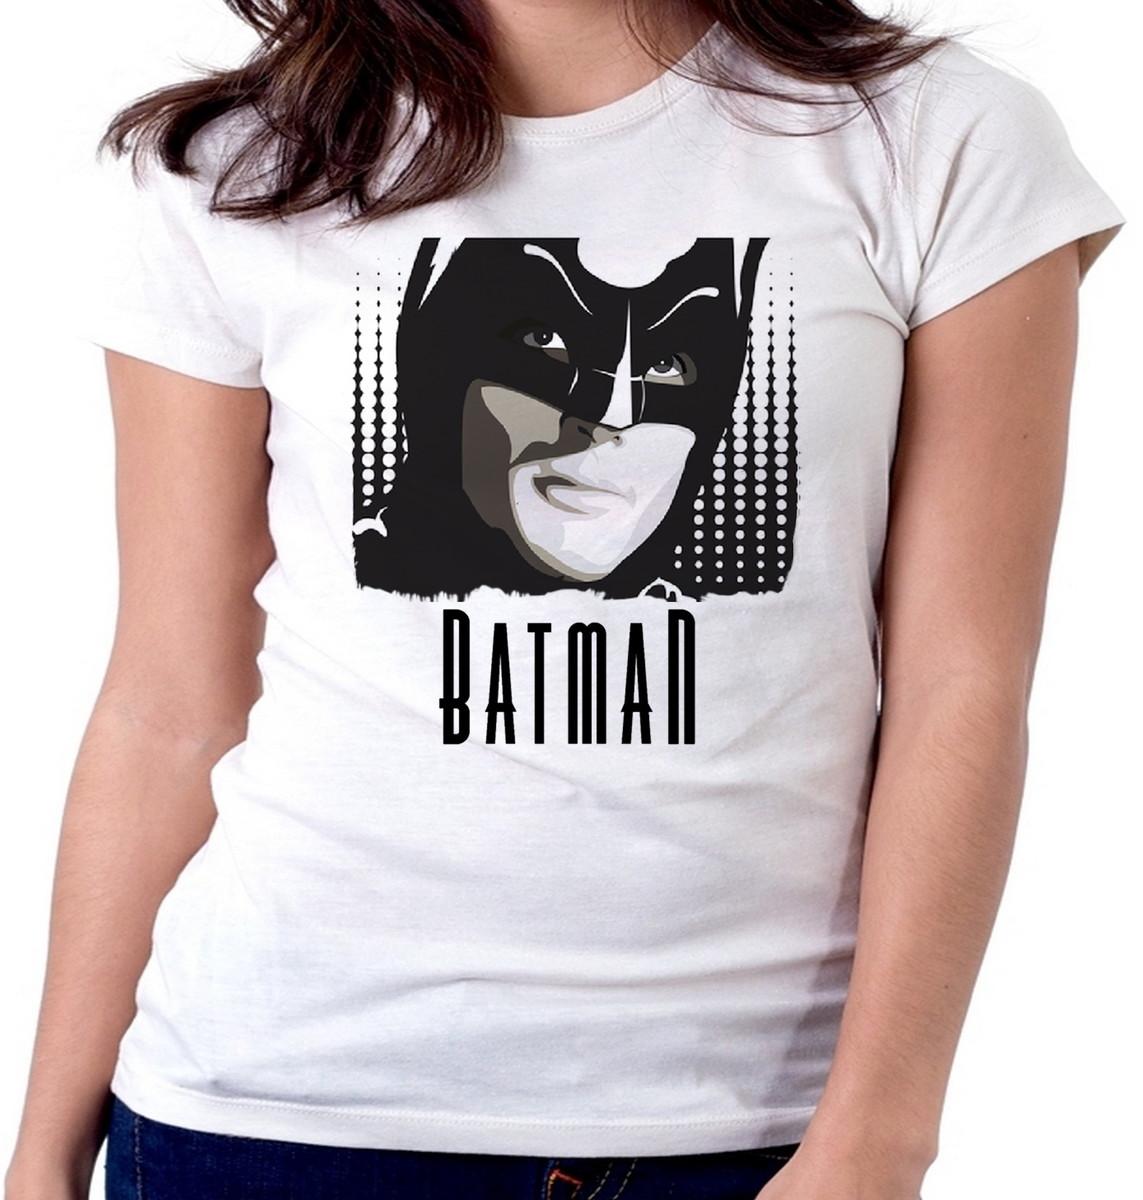 d8f7de079e Blusa feminina baby look camiseta batman retro vintage serie no Elo7 ...